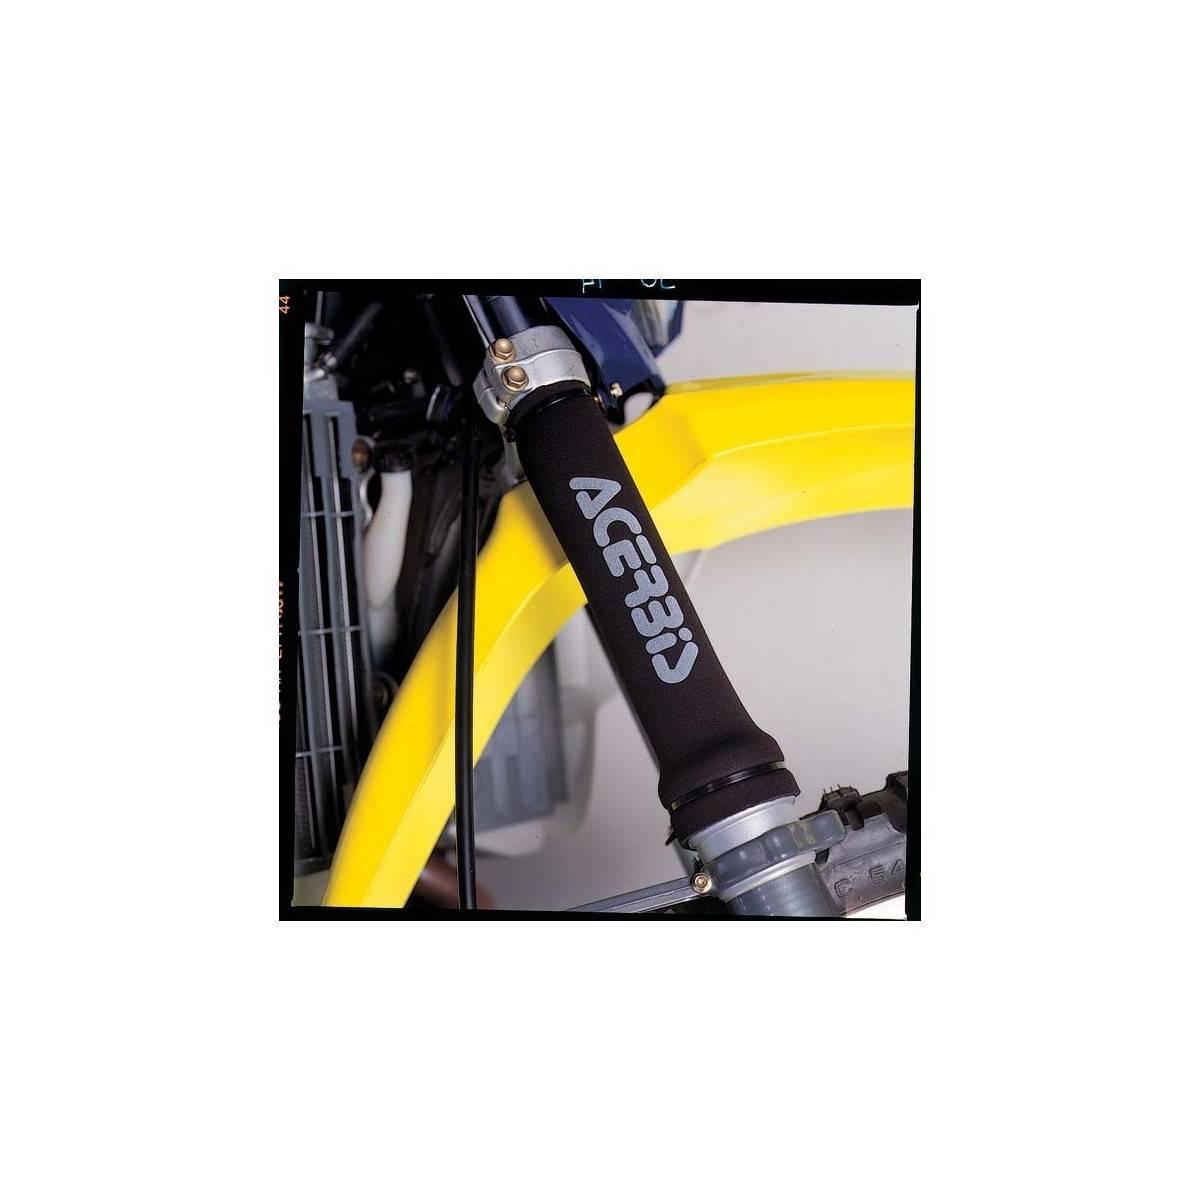 0005094 - Fuelles Neopreno Acerbis